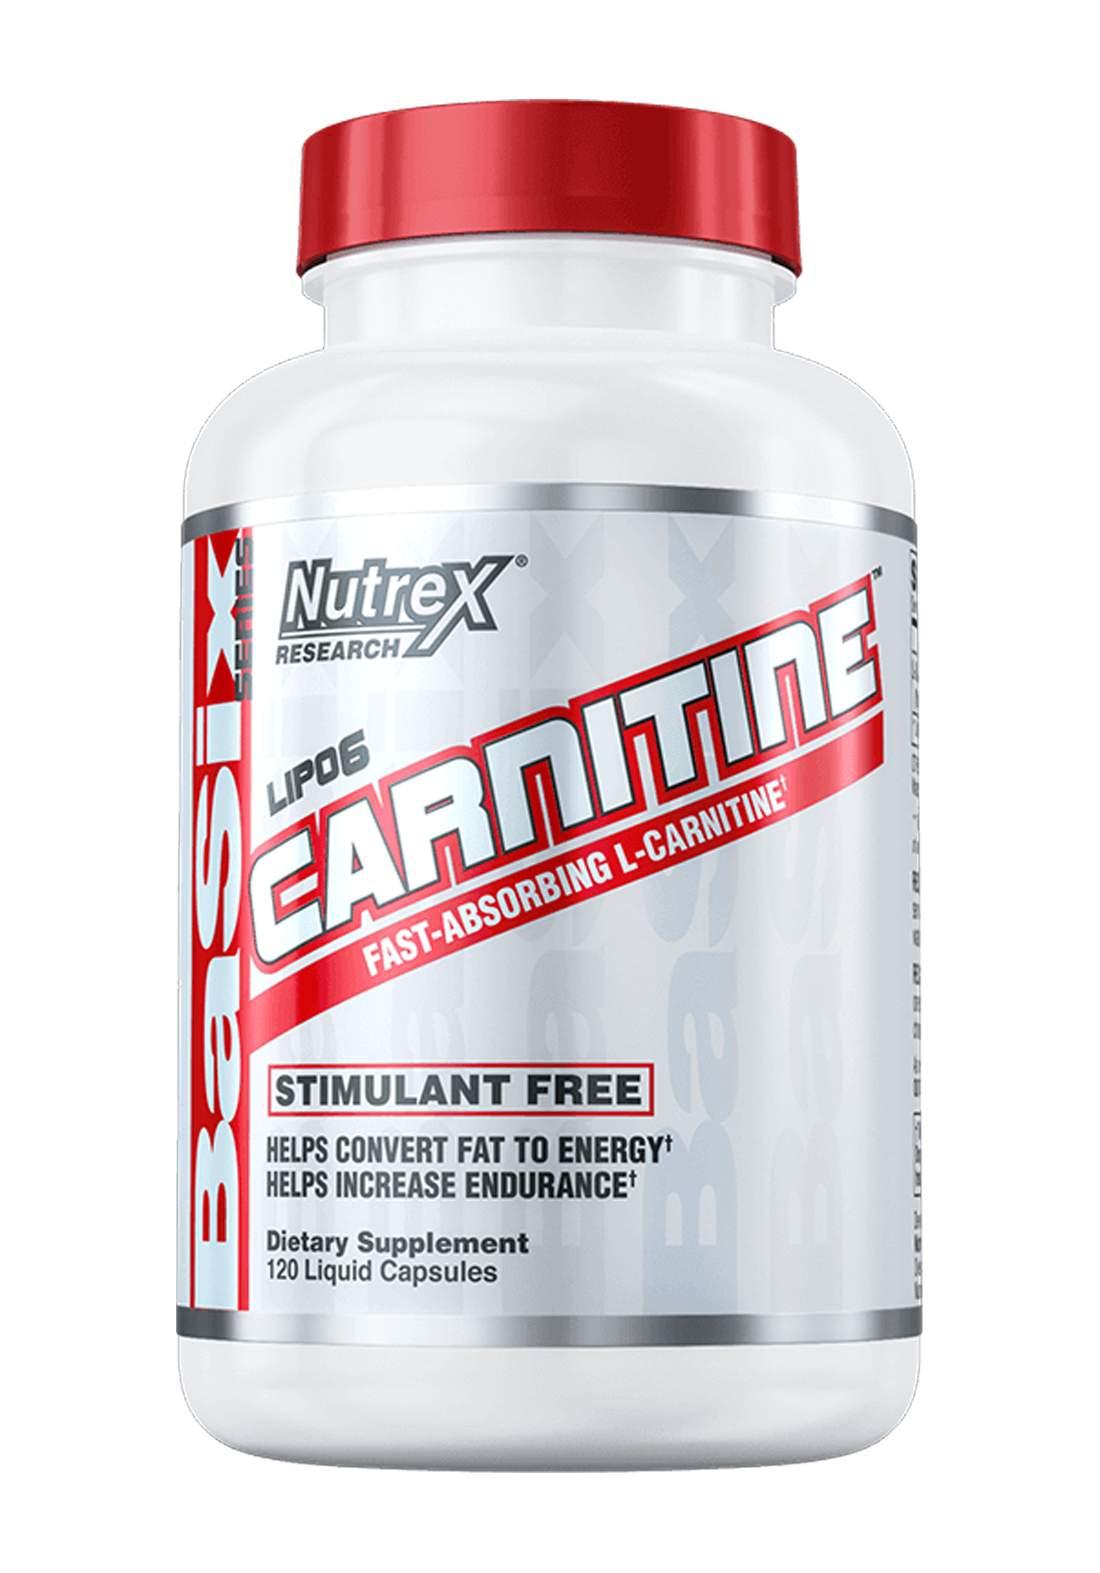 Nutrex Lipo 6  Carnitine Fast Absorbing  120 Liquid Caps   مكمل غذائي لانقاص الوزن